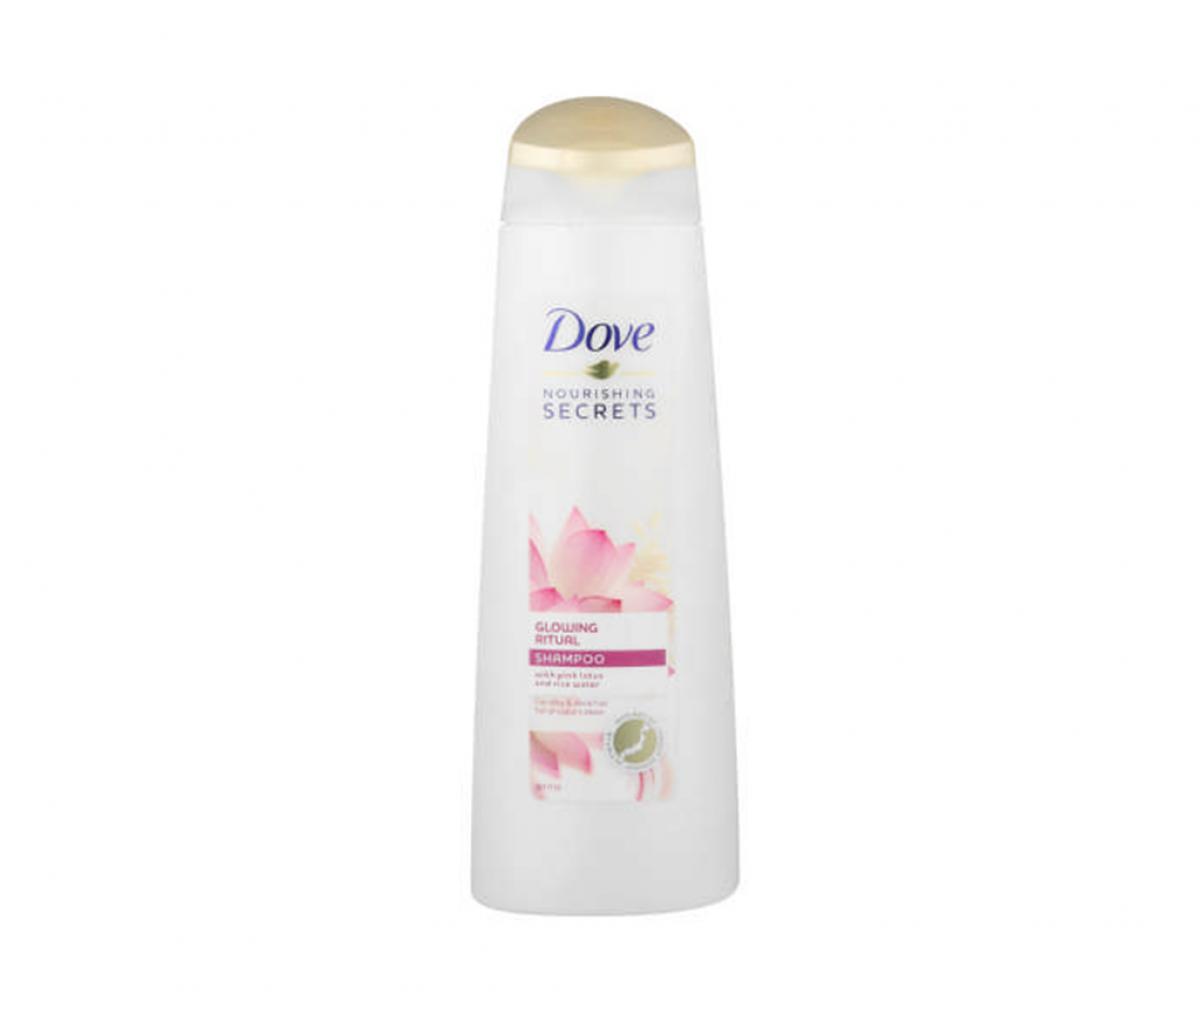 Dove  Glowing Ritual Shampoo